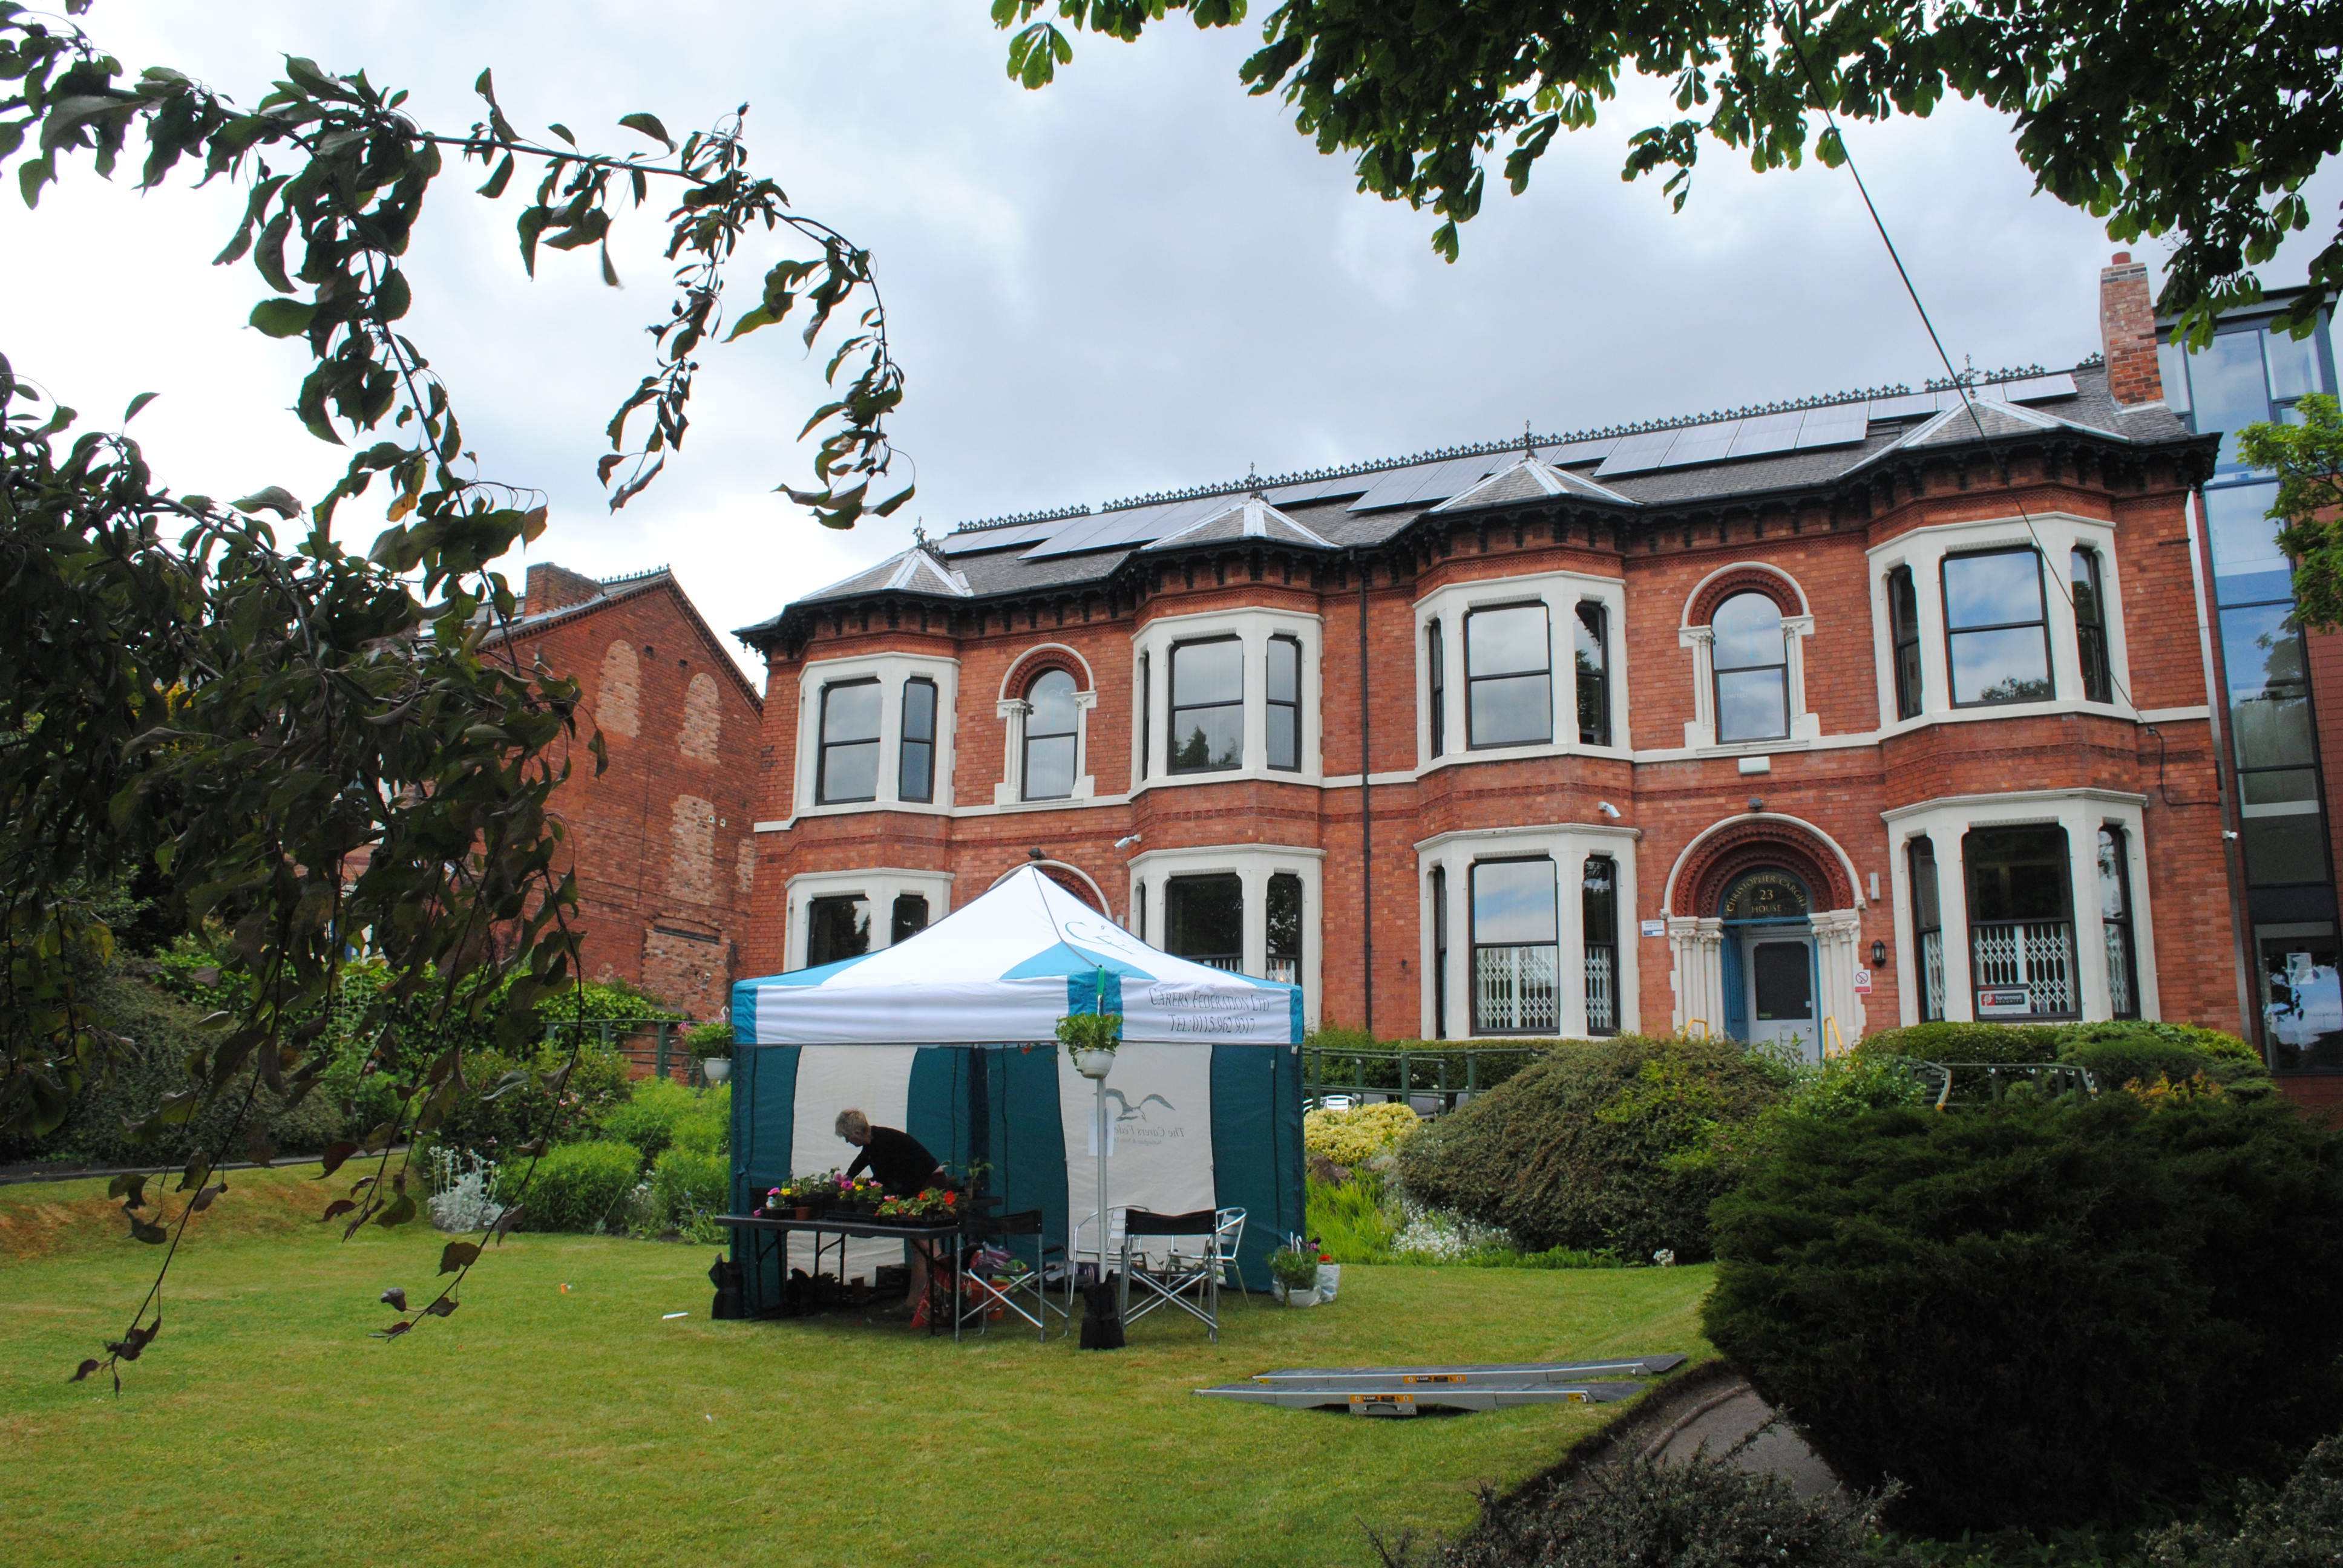 carers-day-2015-gerry-molumby-34